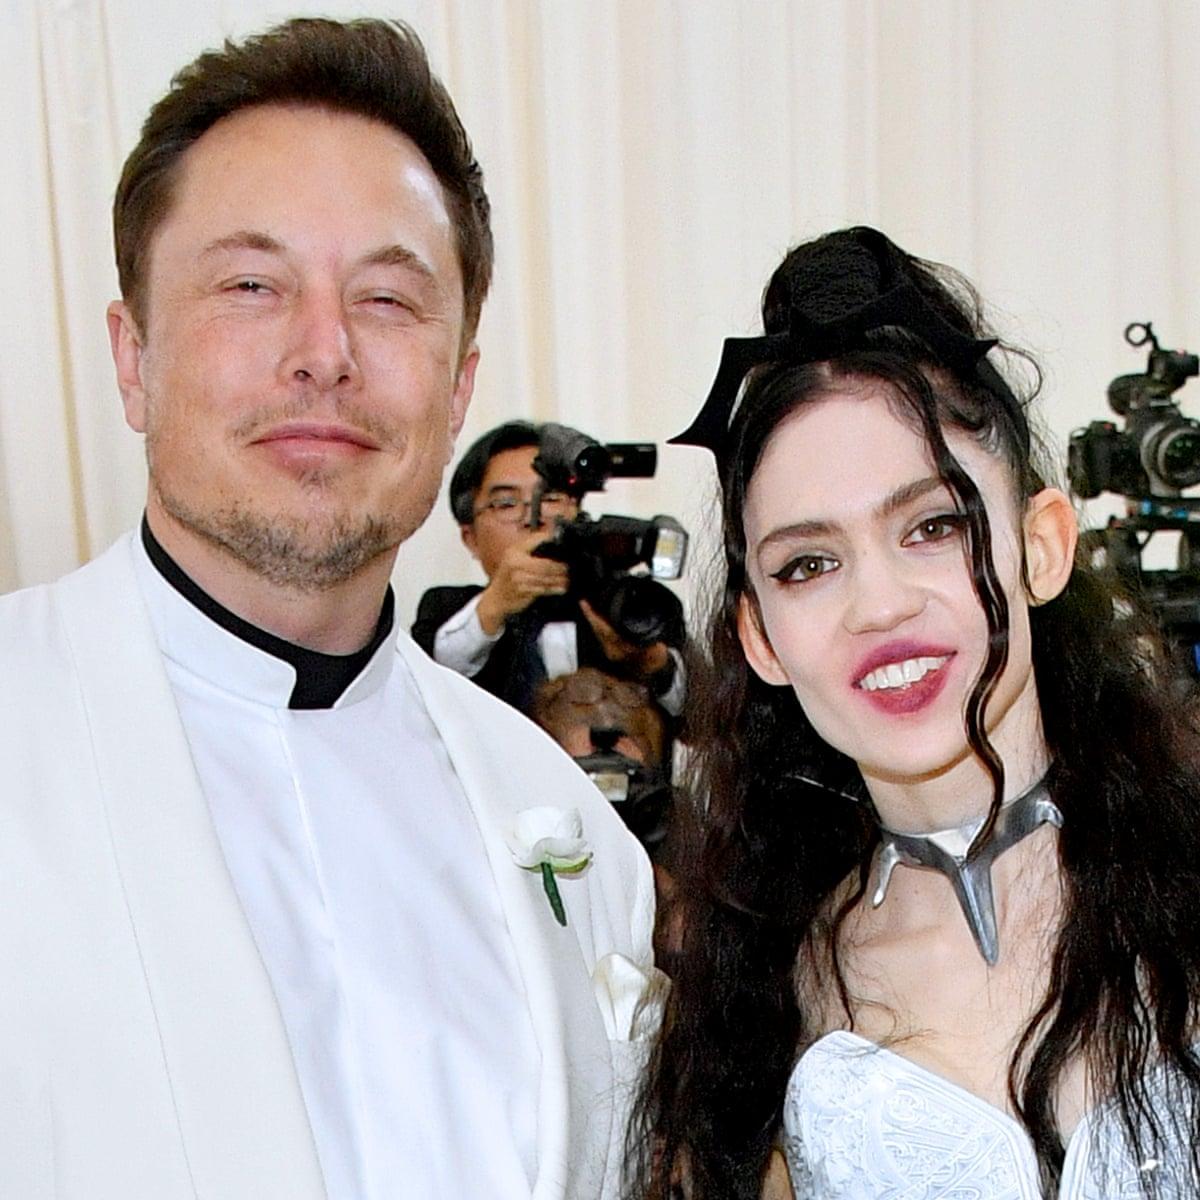 Grimes and Azealia Banks subpoenaed in Elon Musk lawsuit | Azealia Banks